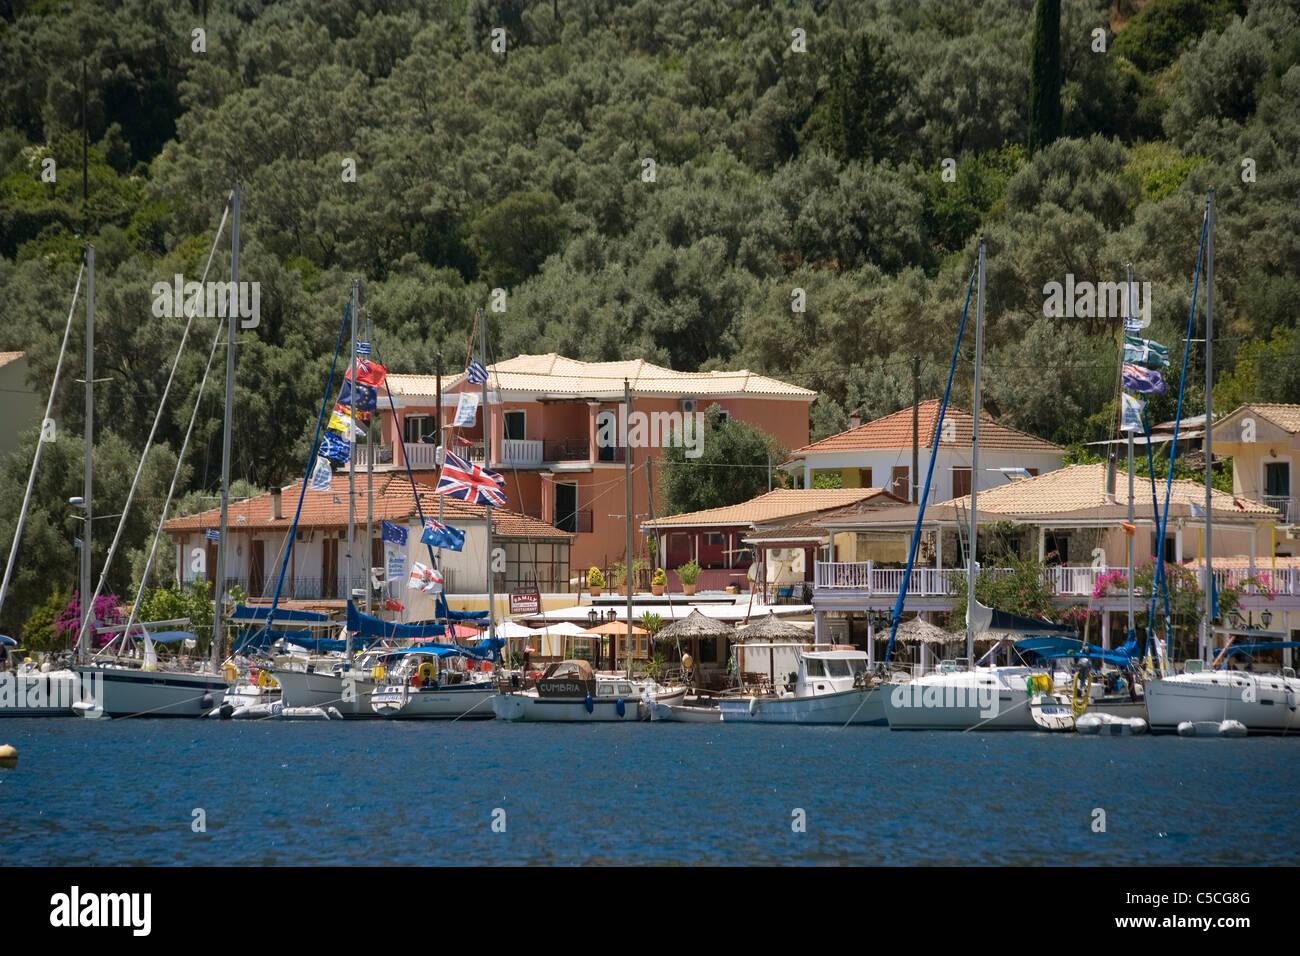 Greece Ionian islands Lefkada Sivota - Stock Image